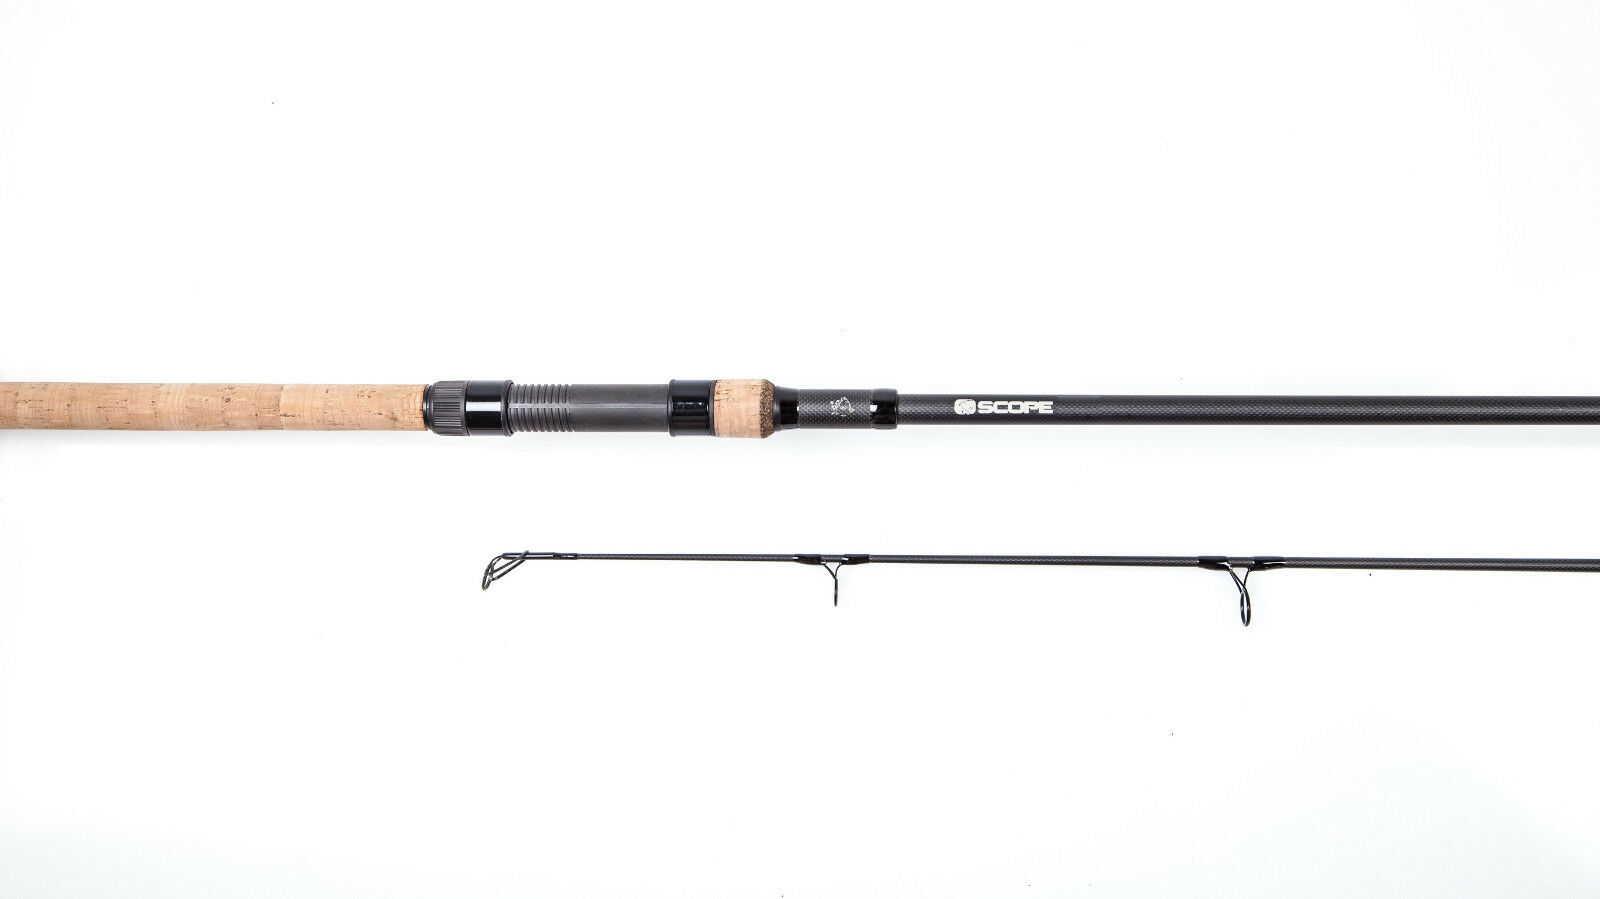 Nash scope Cork rod karpfenrute corcho vara rod caña de pescar carp rod corcho